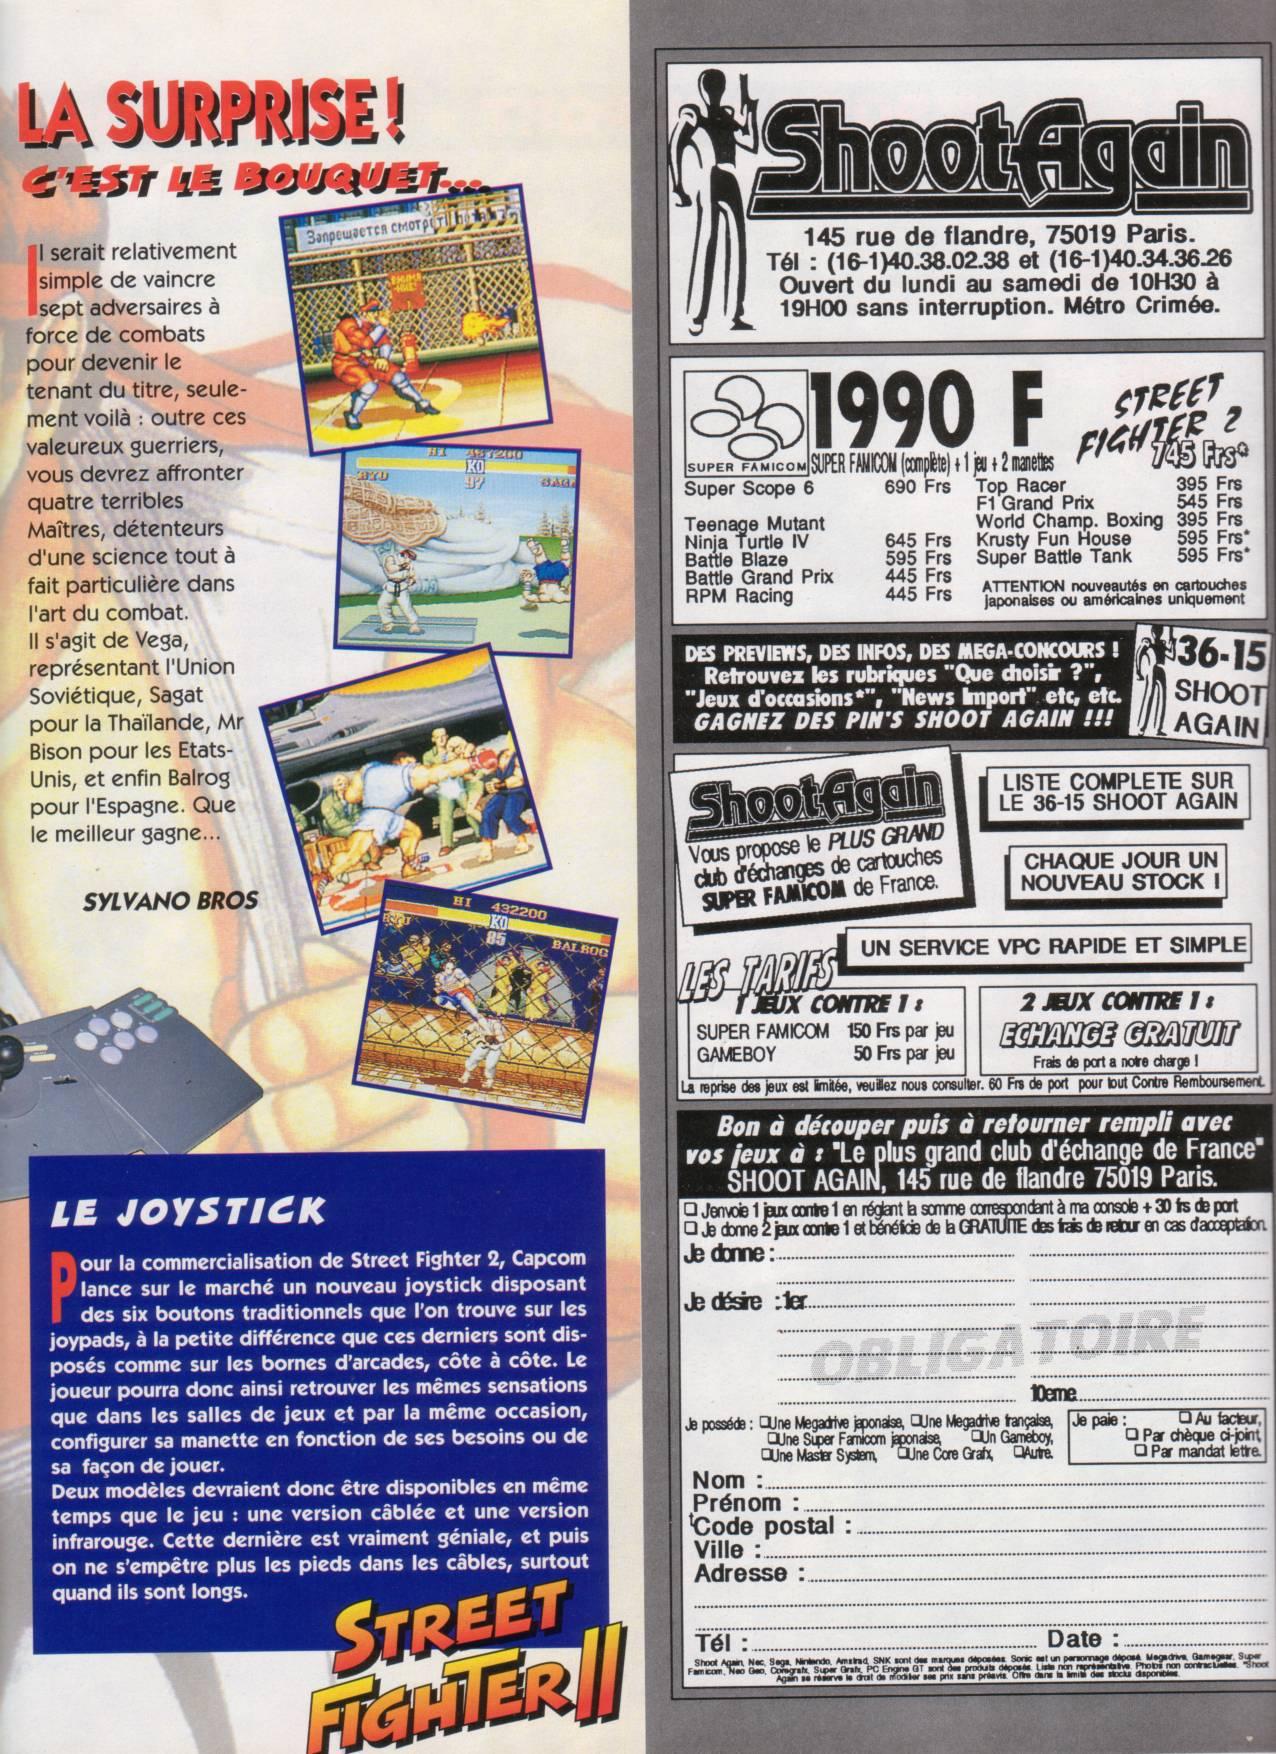 http://download.abandonware.org/magazines/Super%20Power/superpower_numero01/Super%20Power%20001%20-%20Page%20097%20(1992-07-08).jpg